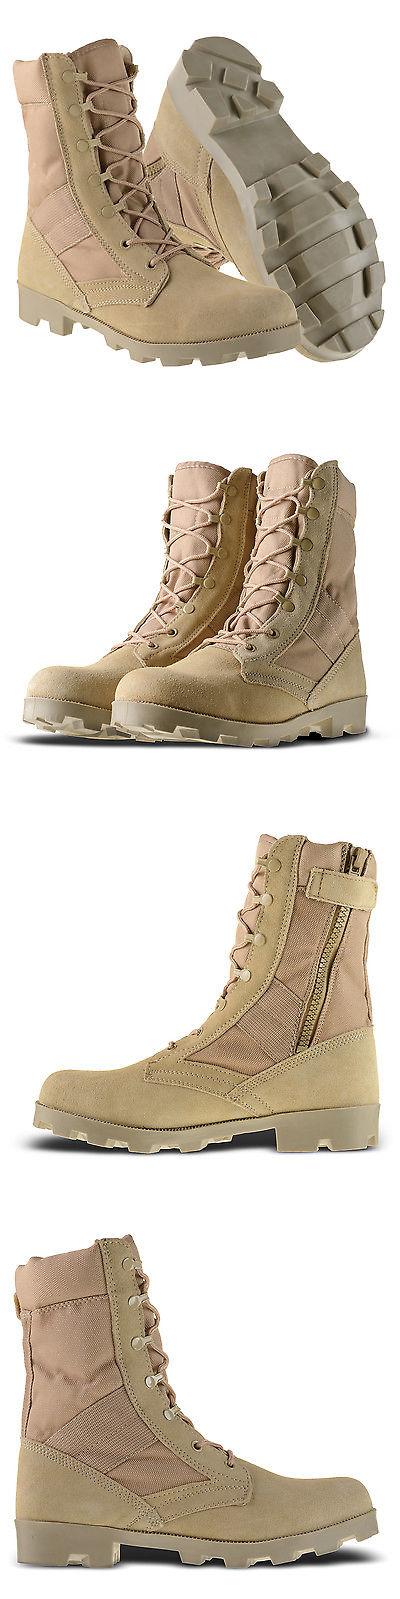 "401c6e5beeb Boots 11498: Ameritac 9"" Side Zip Suede Leather Combat Work Outdoor ..."